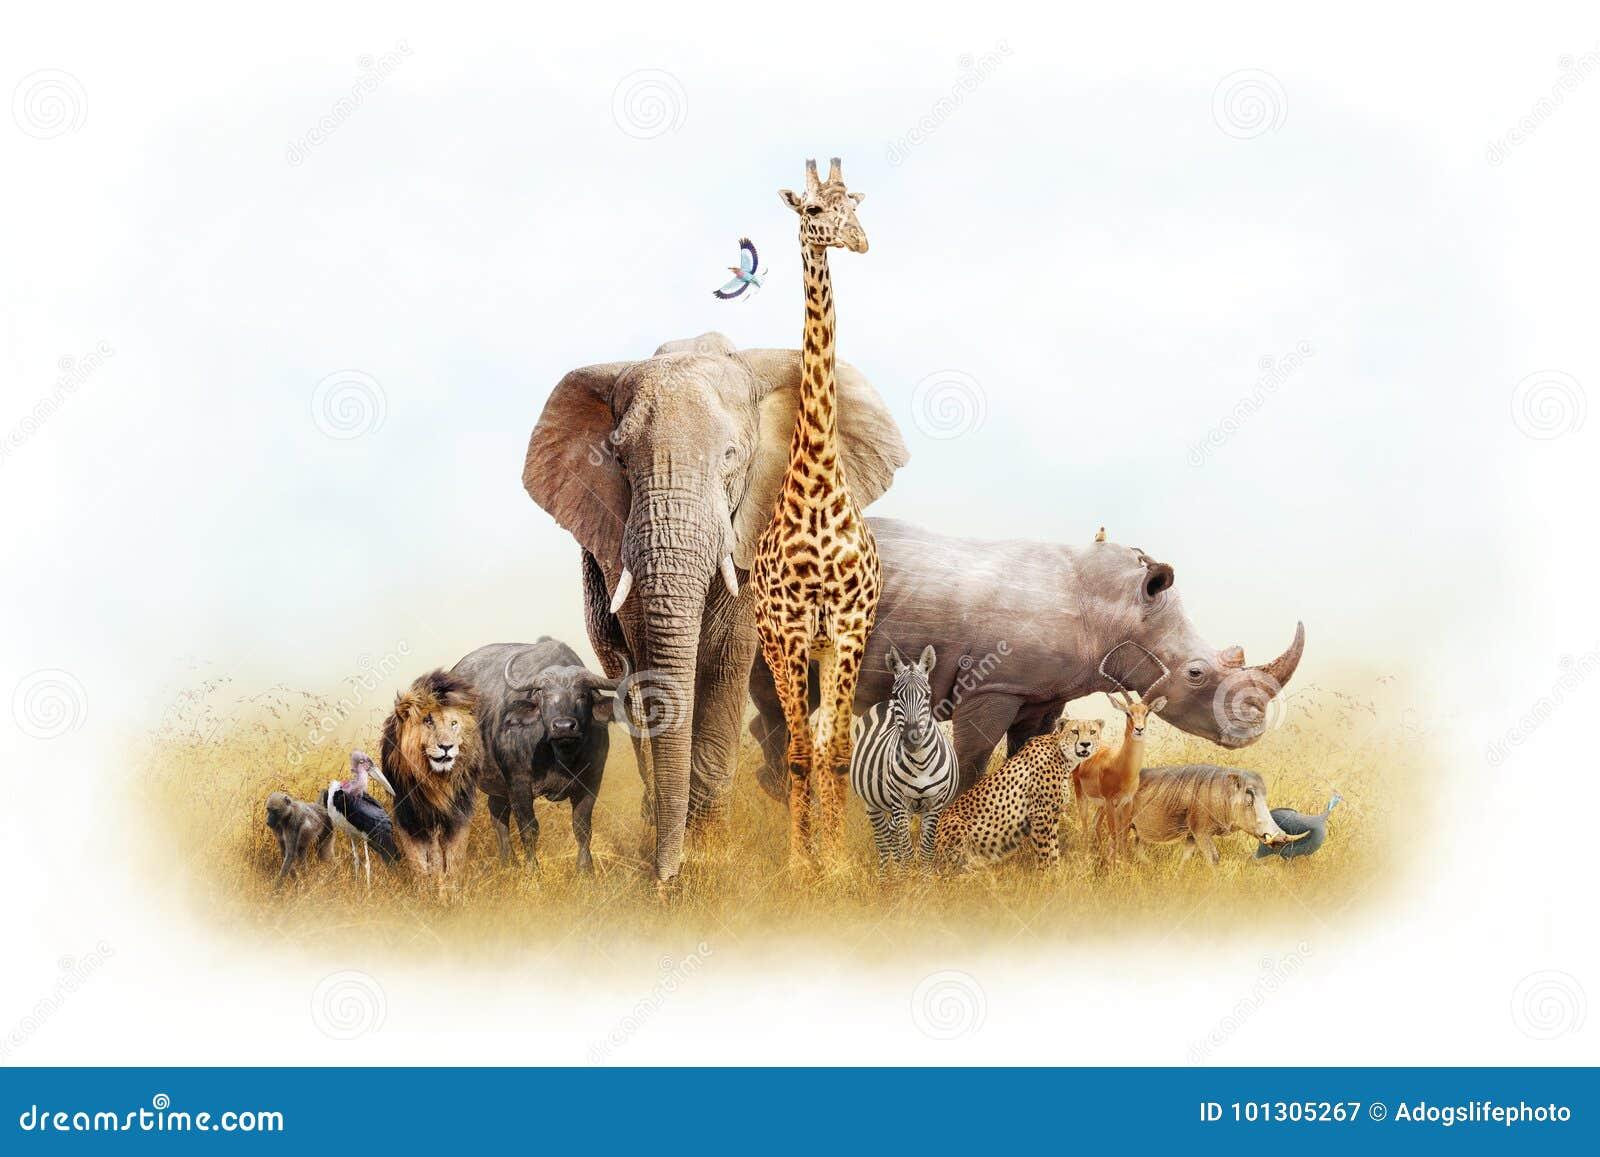 Africano Safari Animal Fantasy Land